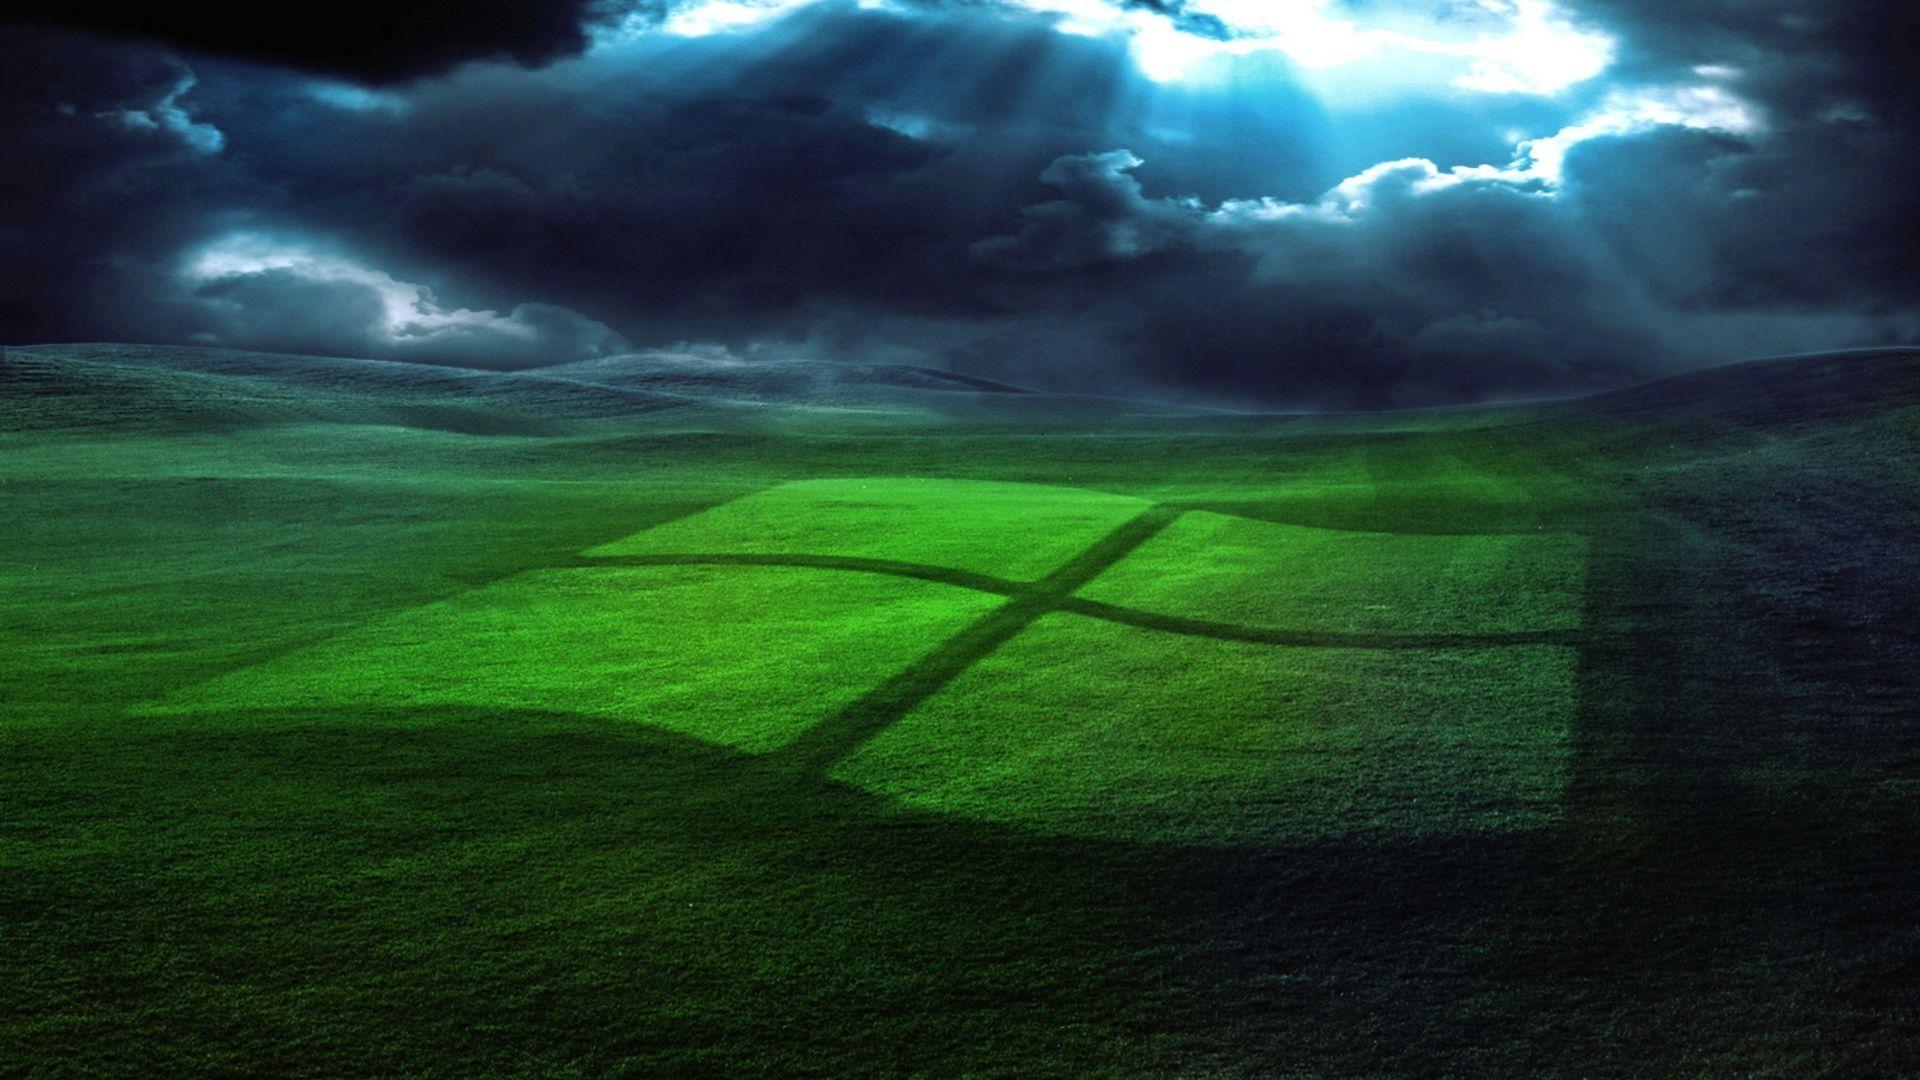 Full Hd 1080p Windows Wallpapers Hd Desktop Backgrounds 1920x1080